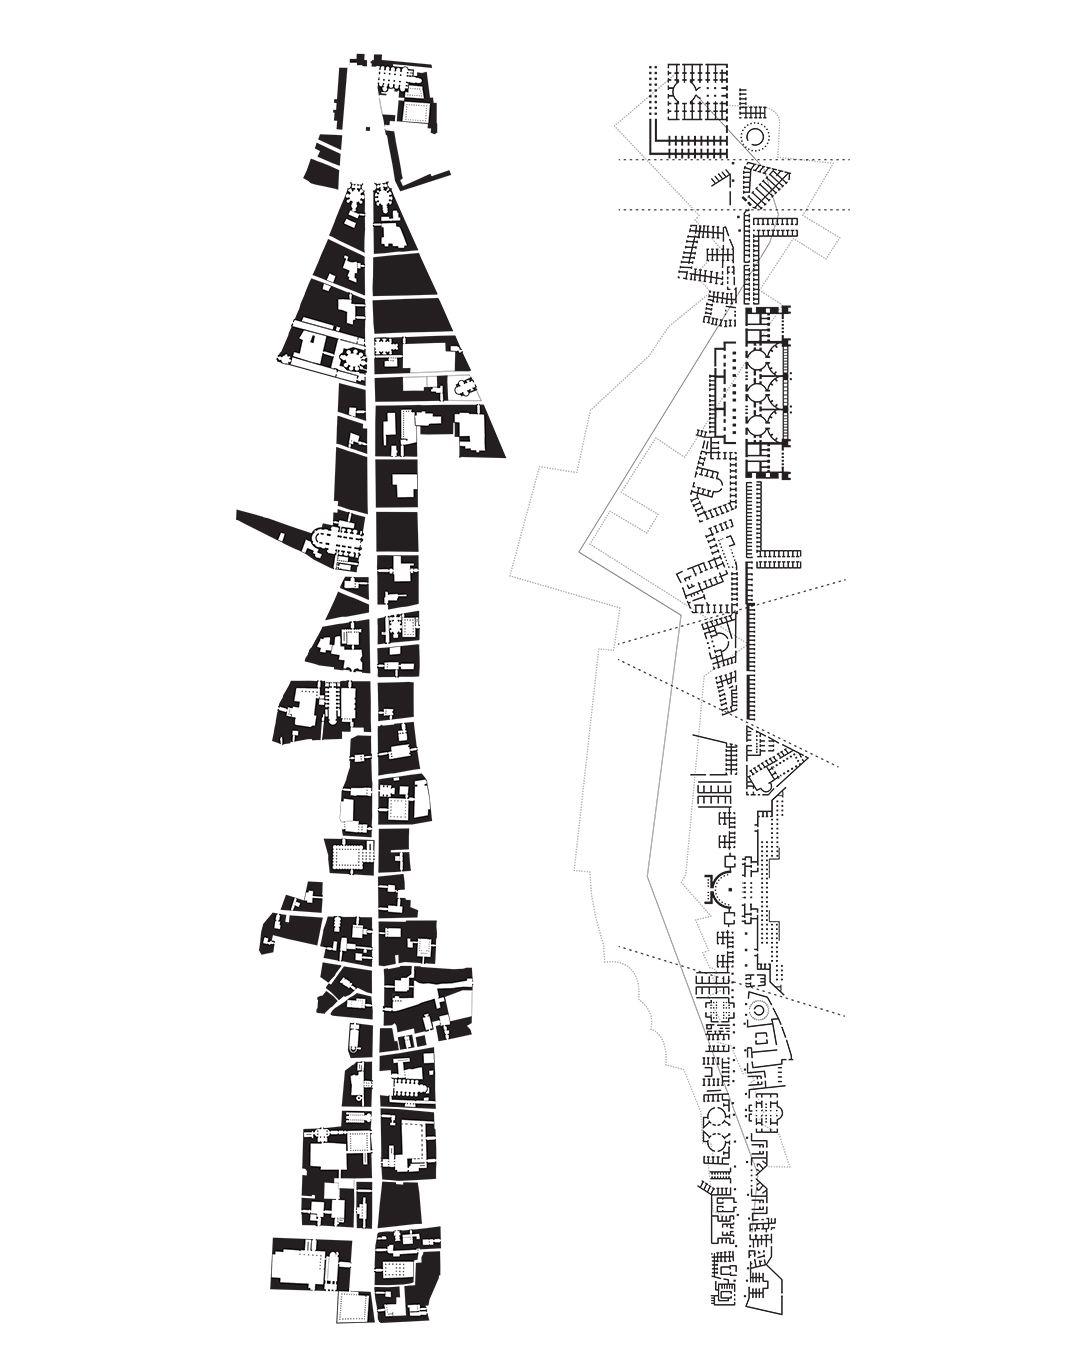 Foco Archive Formalysis Of Nolli And Piranesi Rome